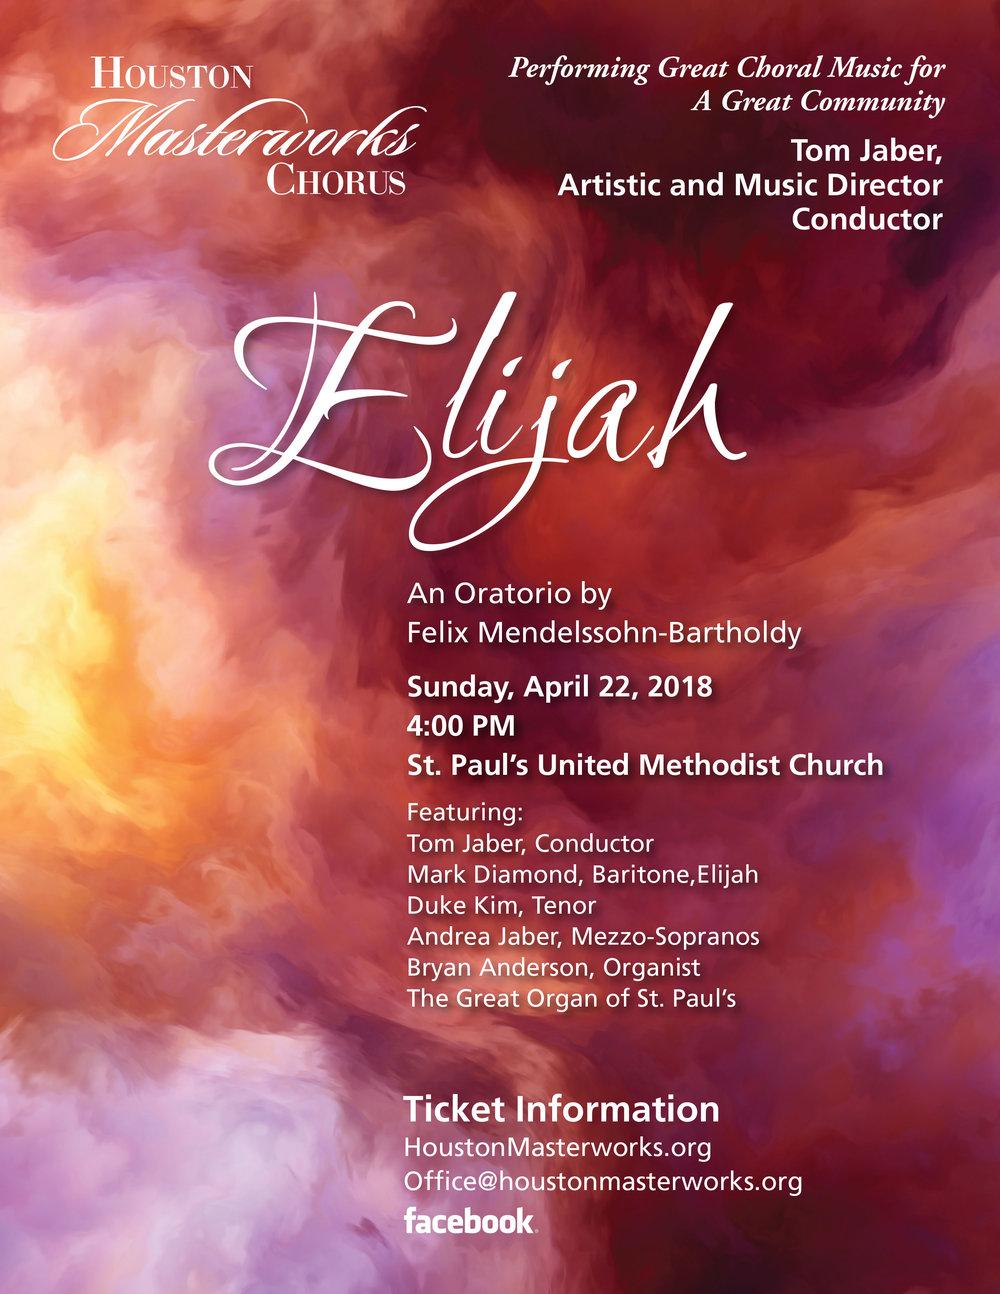 web-Elijah-concert.jpg